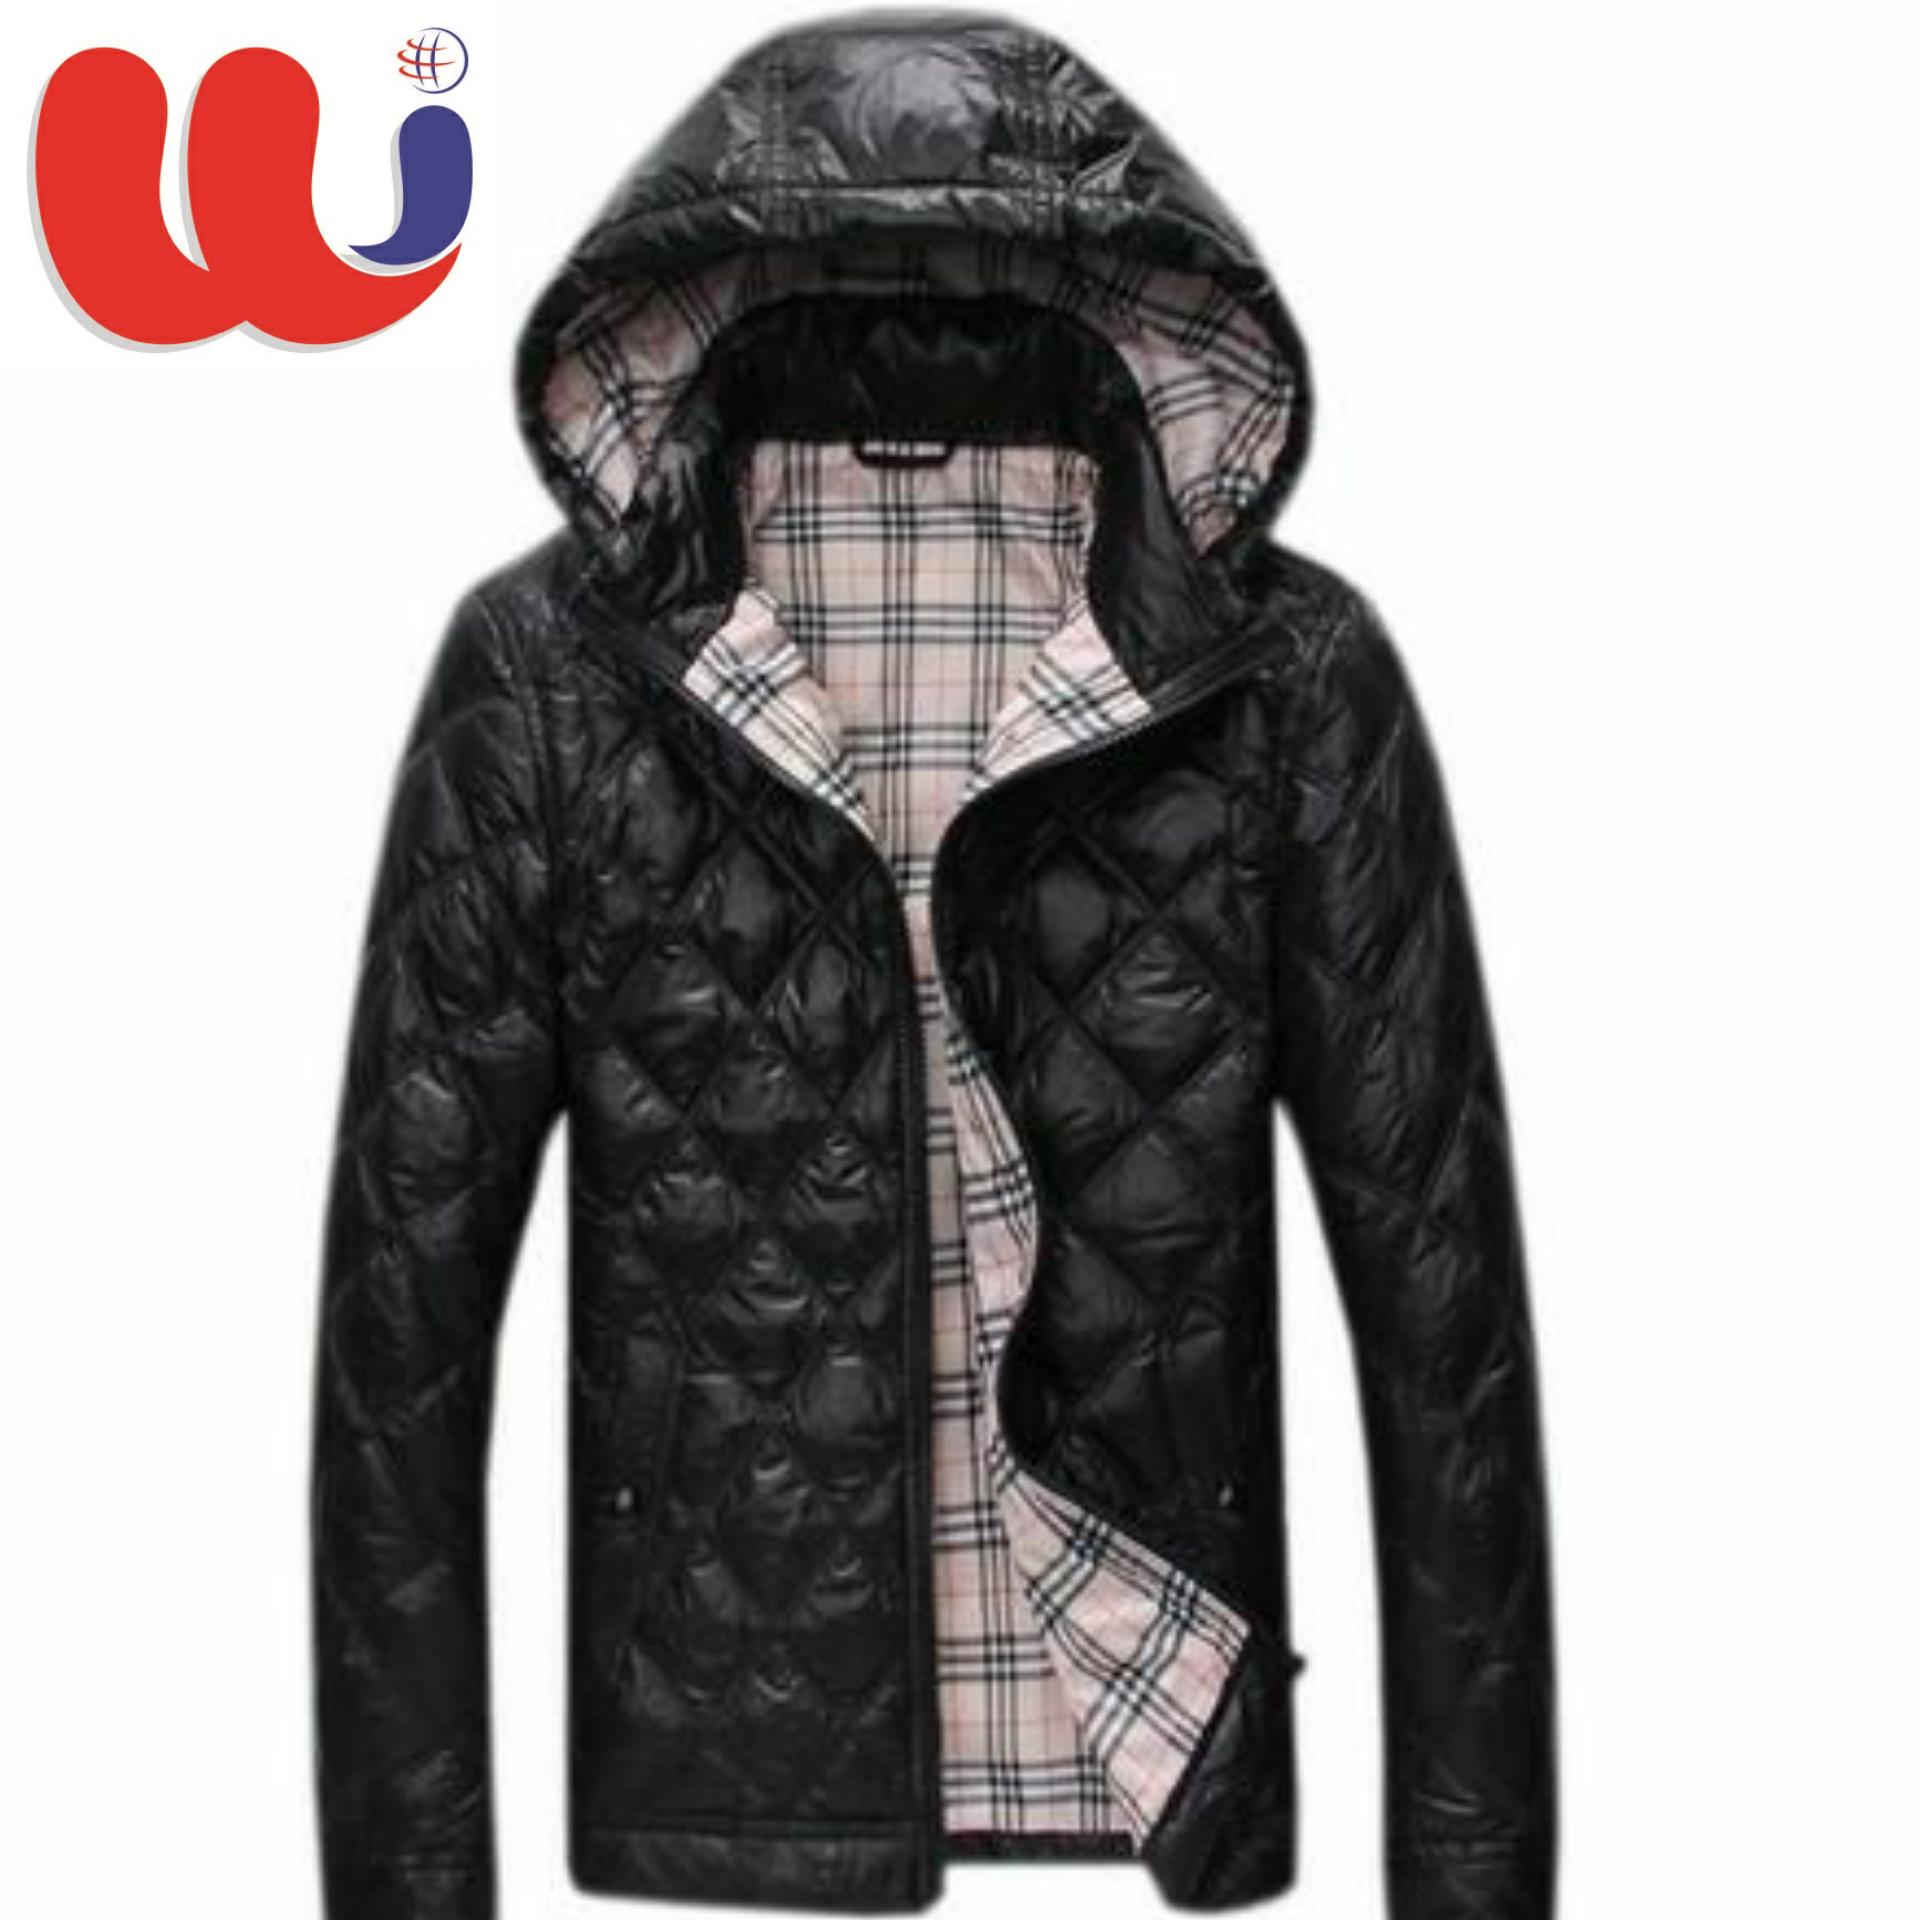 Custom Winter Jackets Micro Cordura Hooded Inner Lining Dm For Pricing Offers Walnasma Winter Jackets Winter Jacket Men Parkas Winter Jacket Men [ 1920 x 1920 Pixel ]